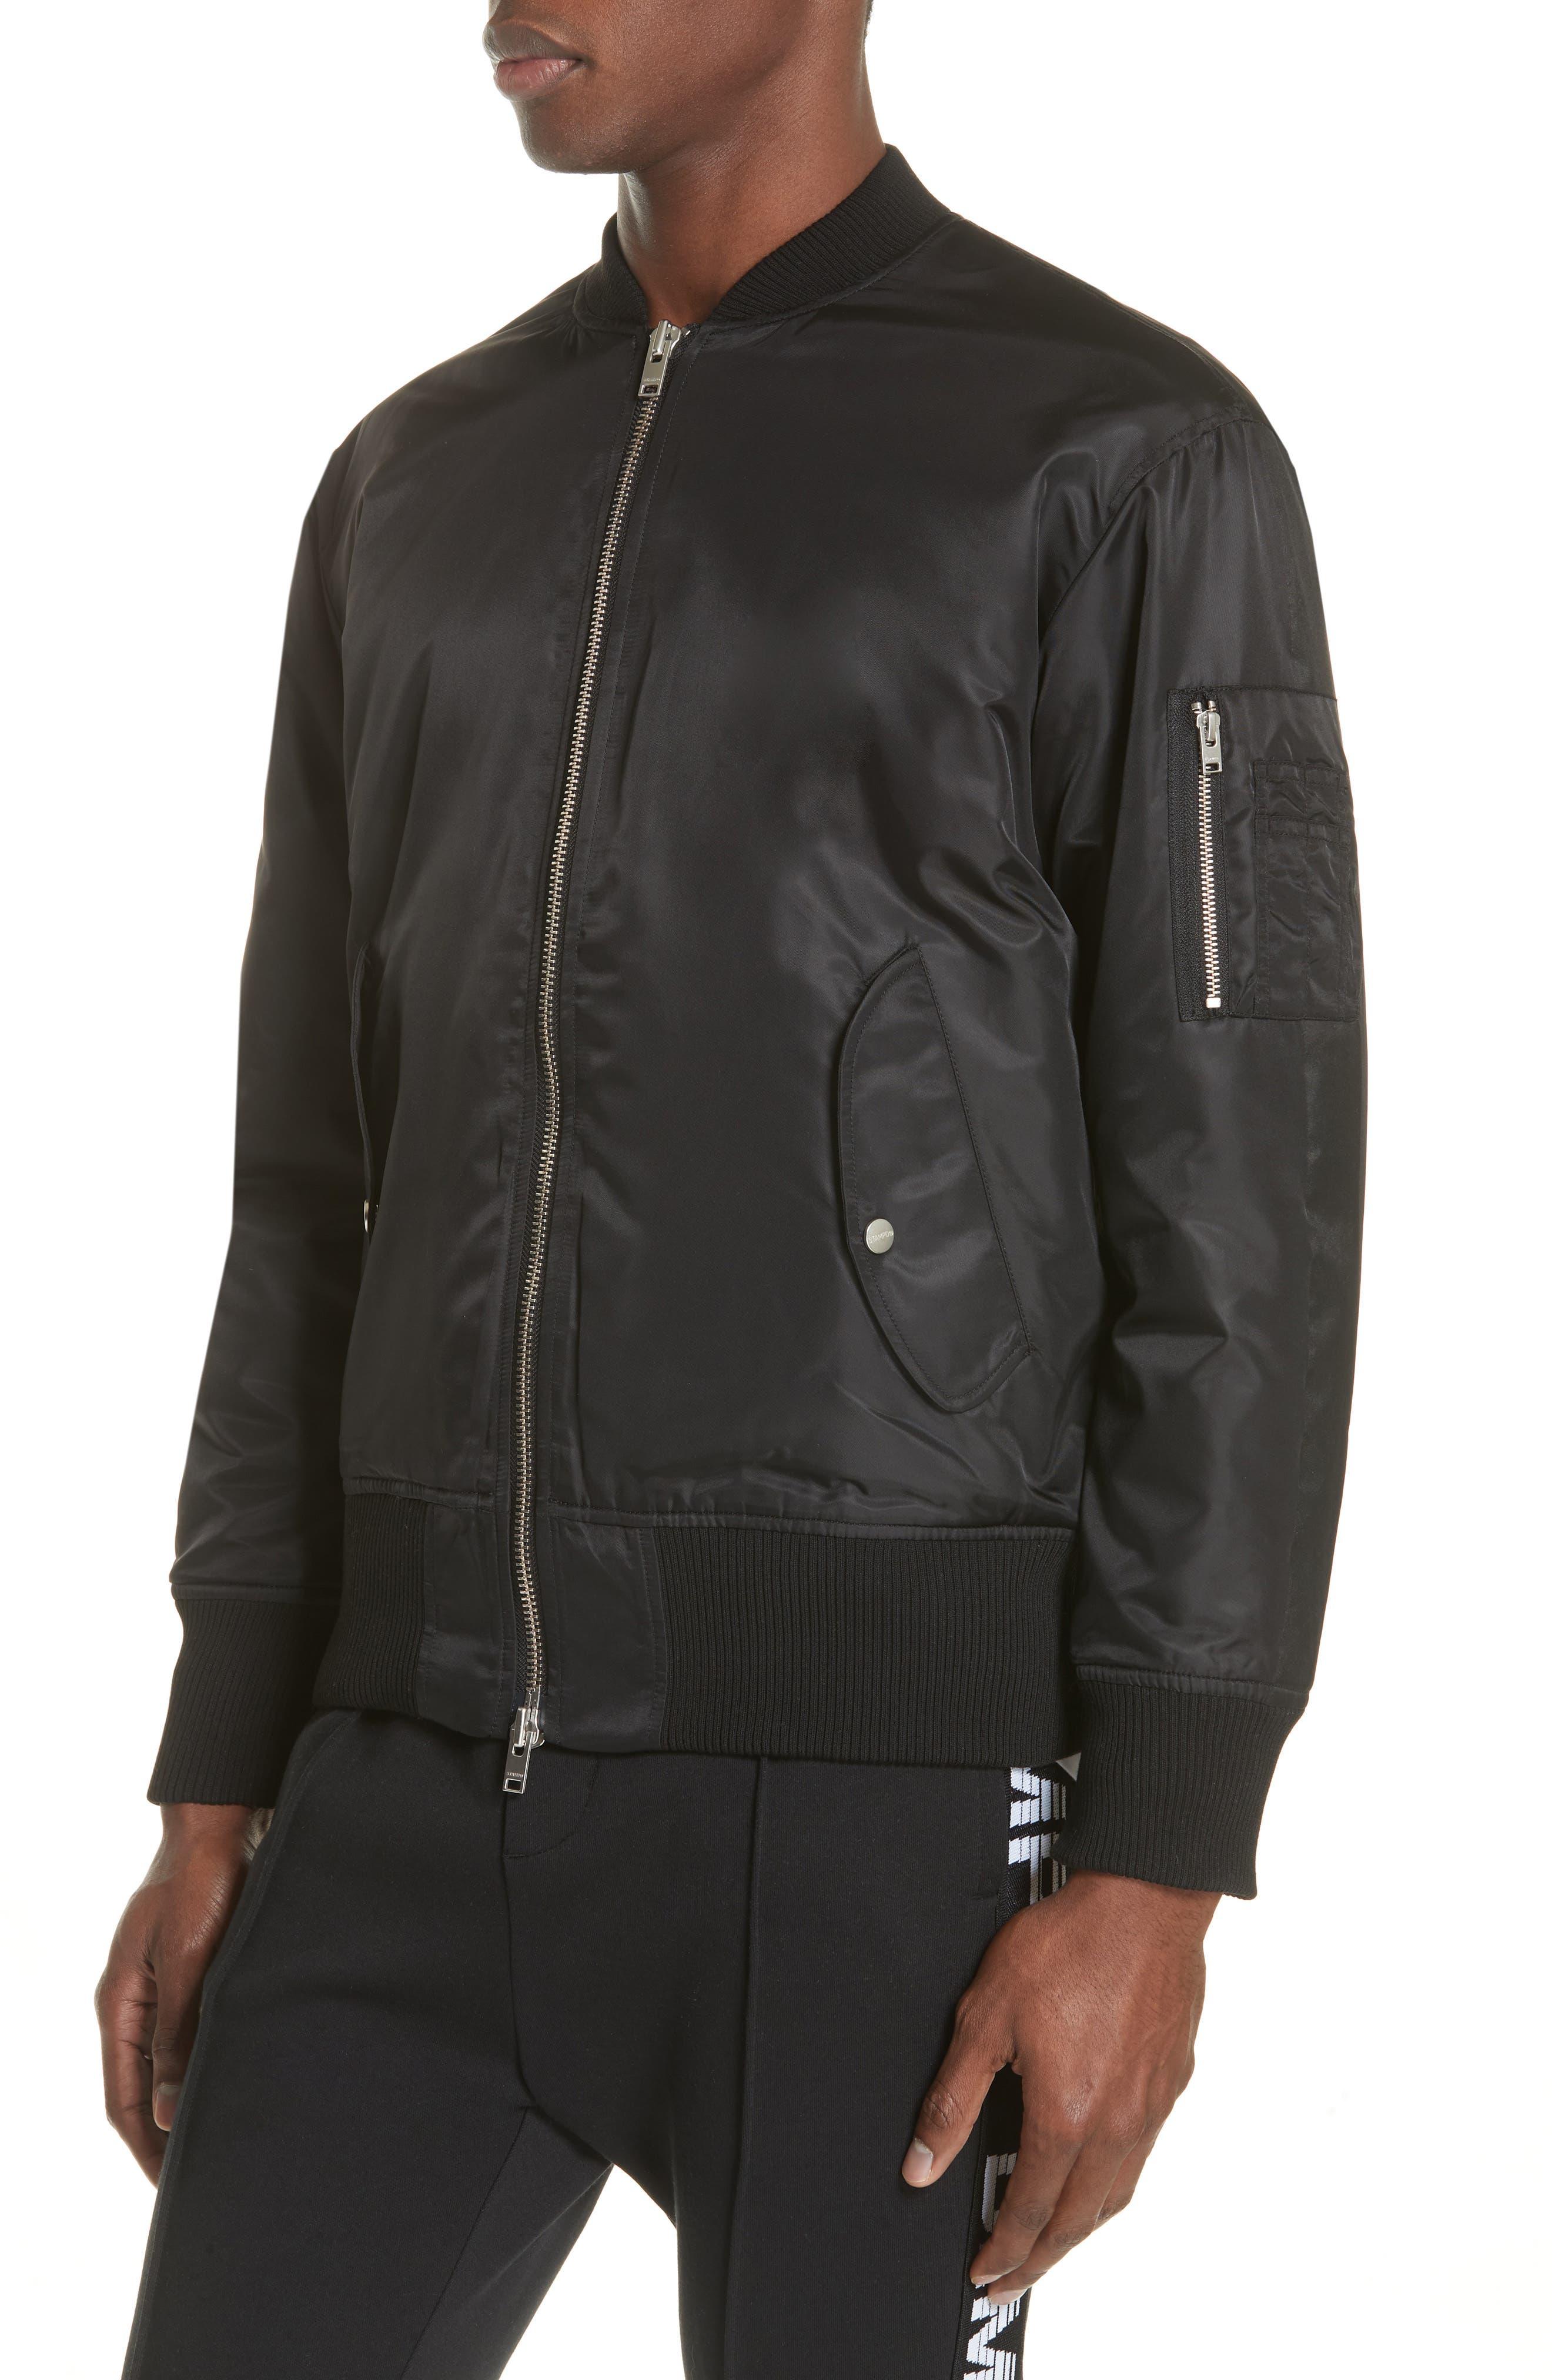 Van Ness Bomber Jacket,                             Alternate thumbnail 4, color,                             Black